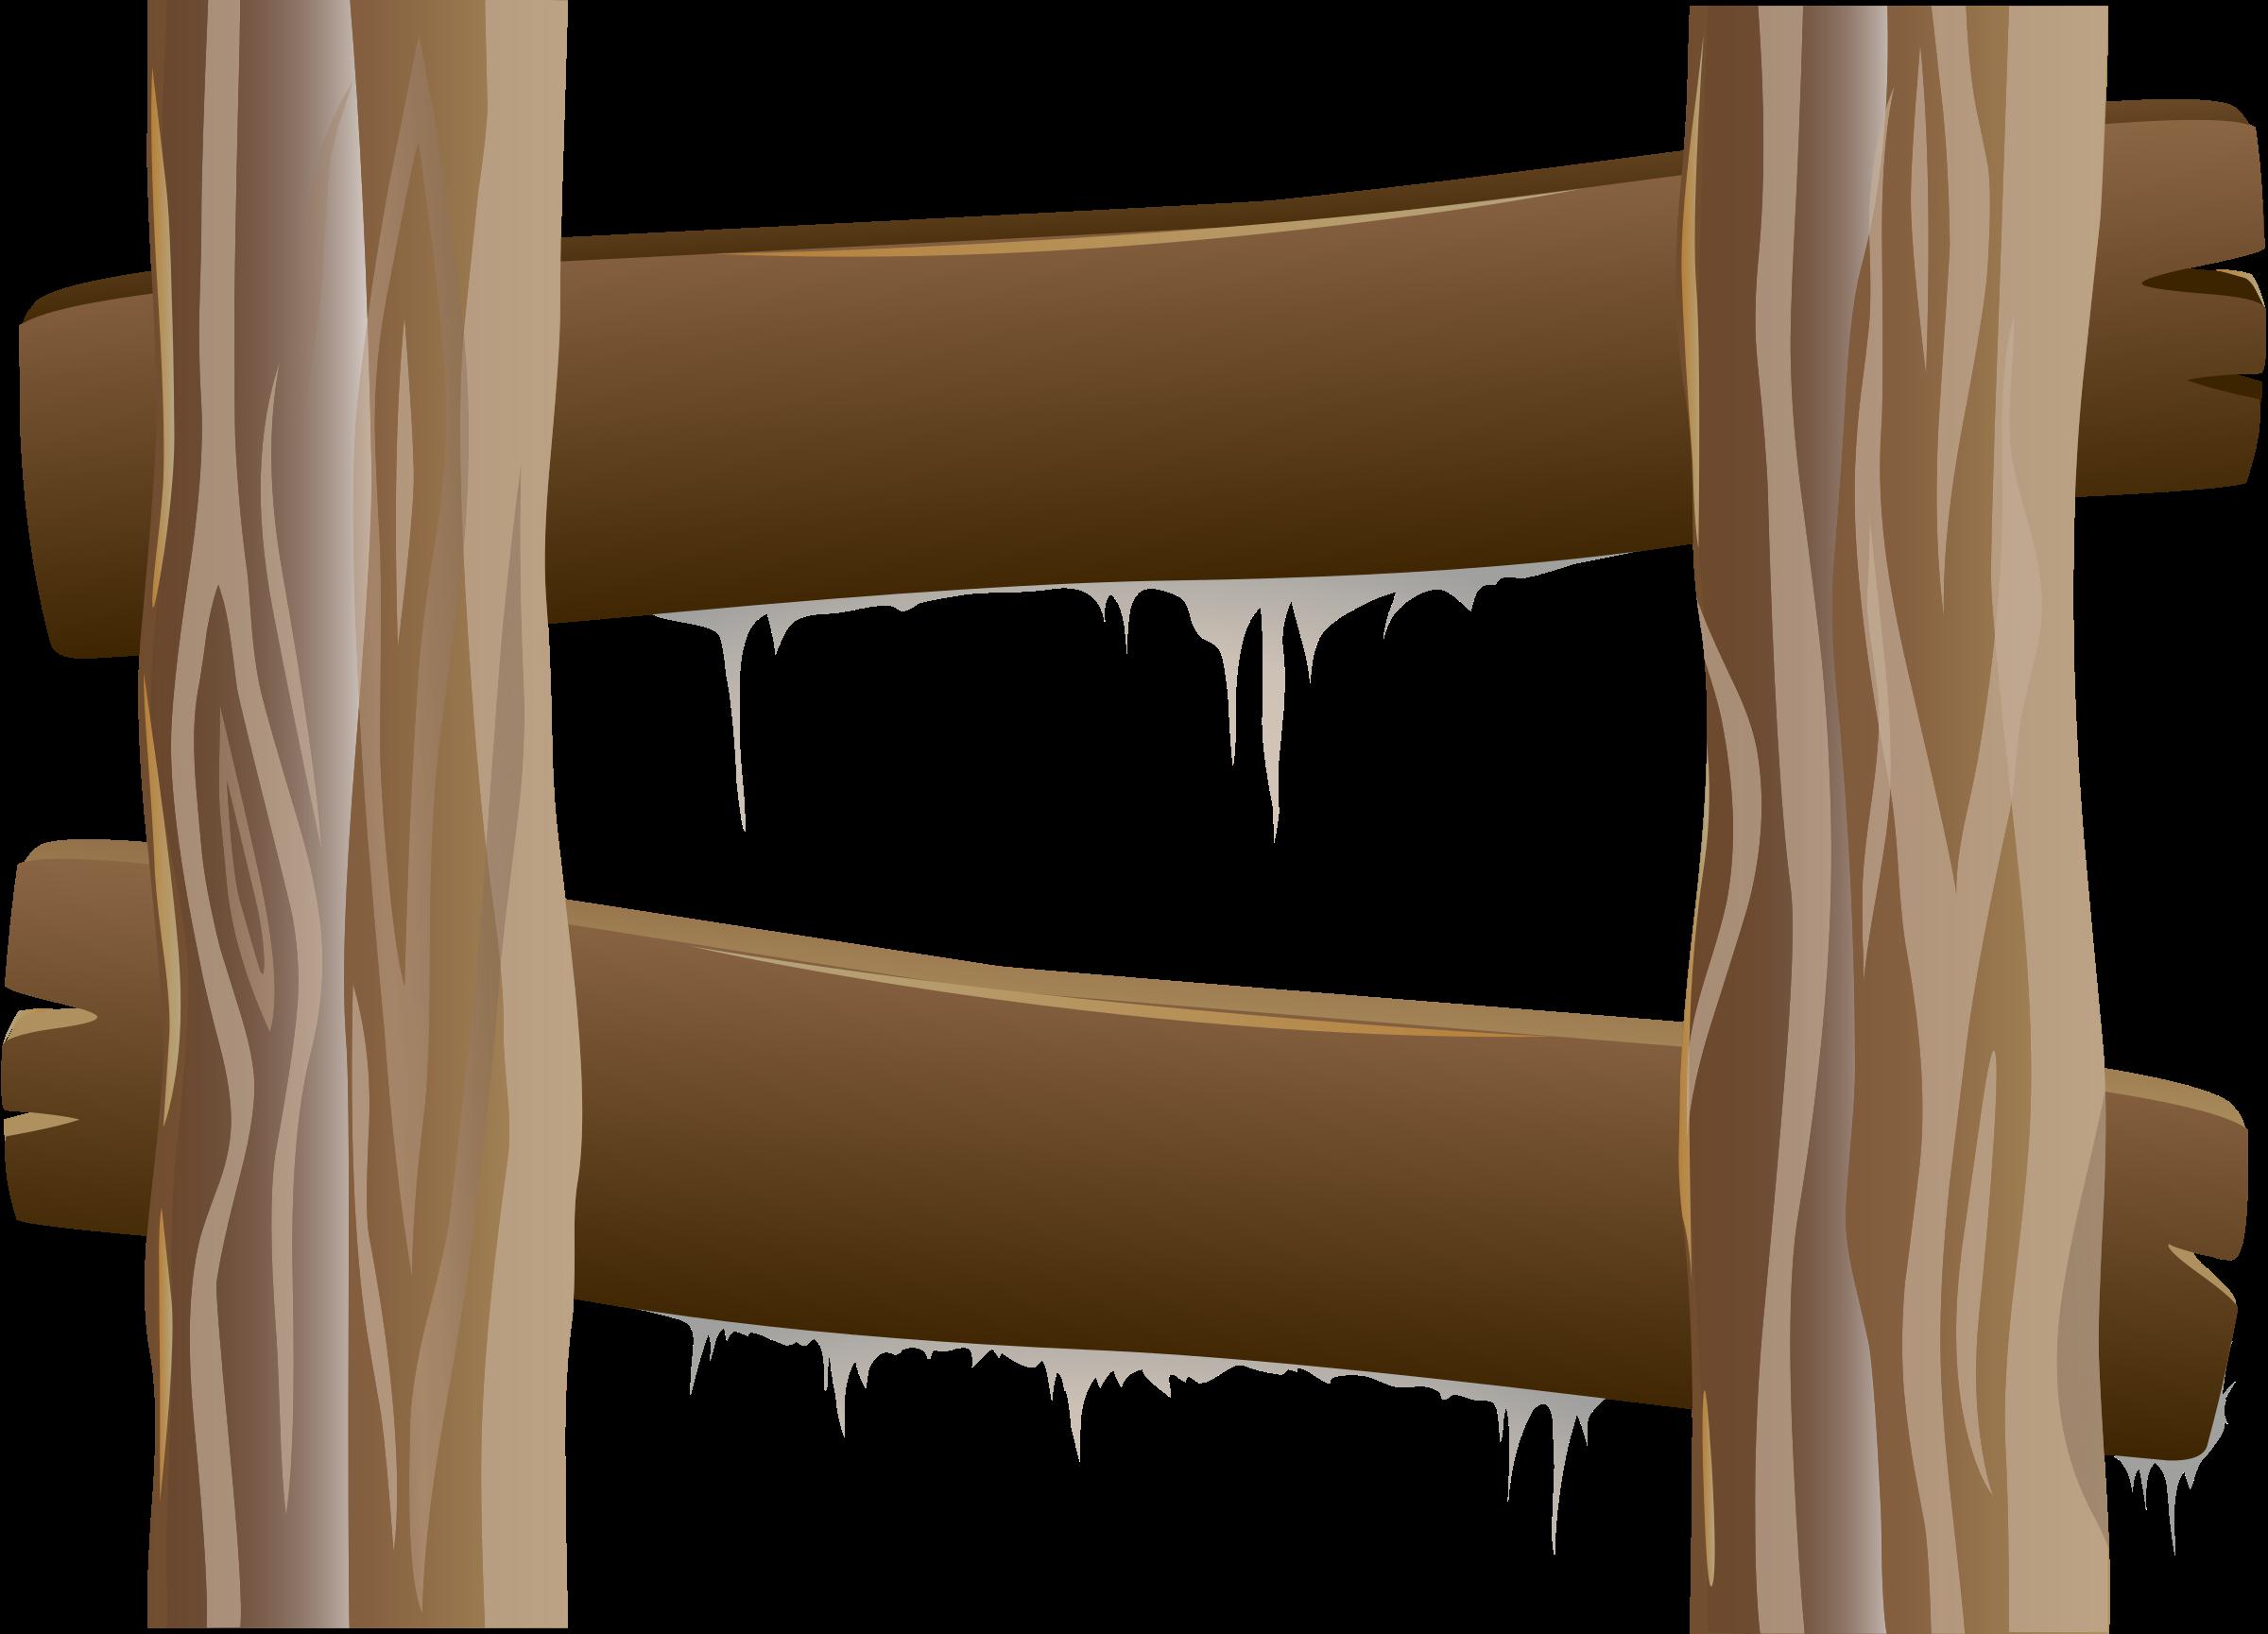 Ladder clipart wood ladder. Ilmenskie tree int icons